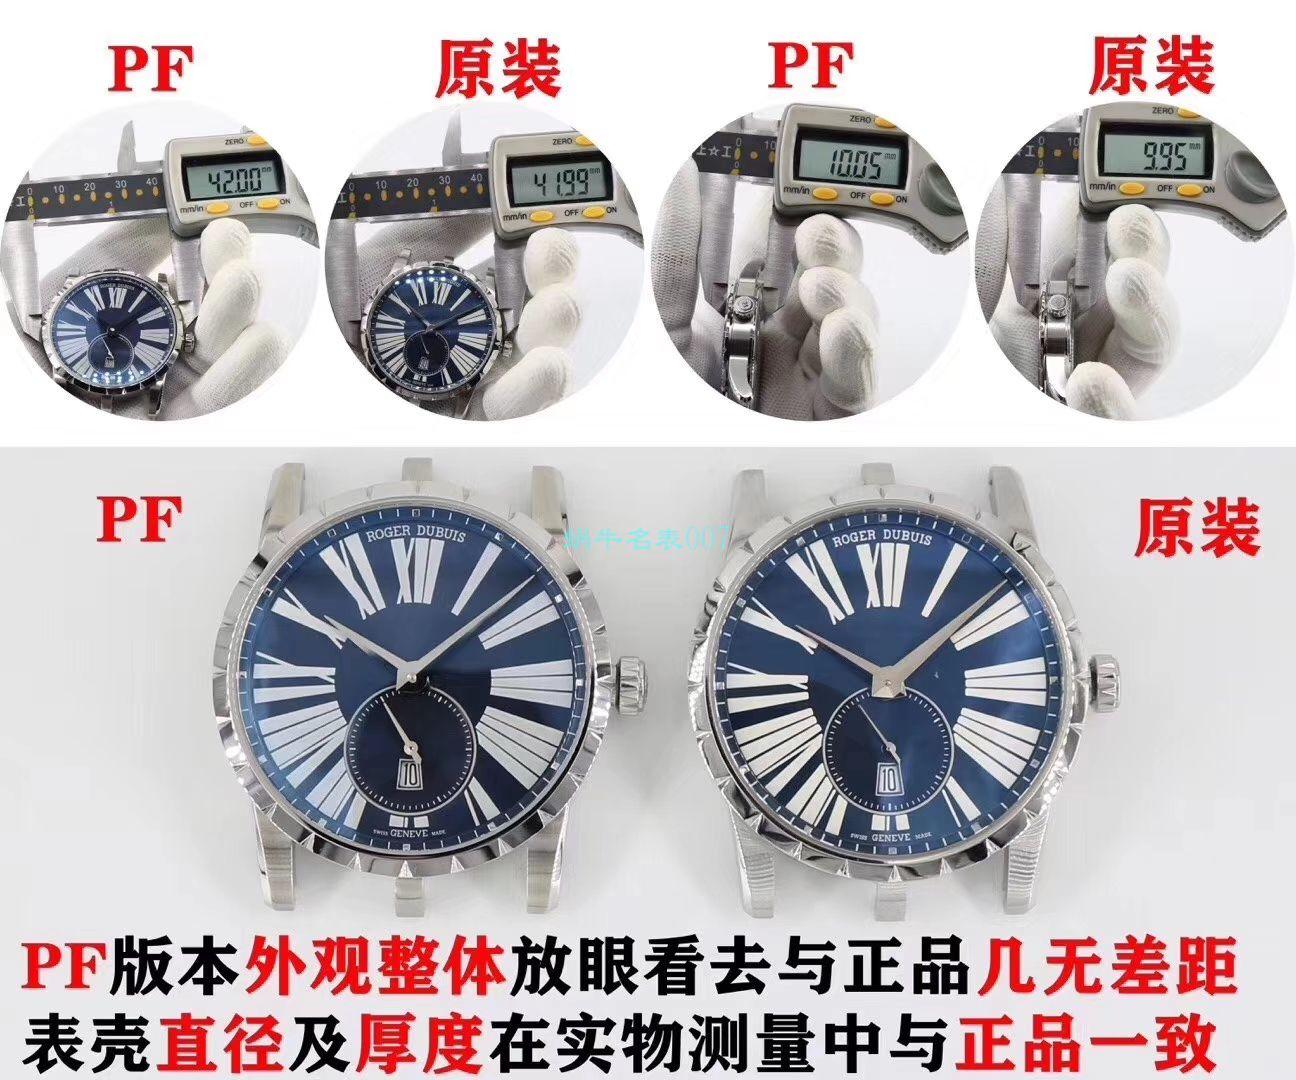 PF厂超A高仿手表罗杰杜彼EXCALIBUR(王者系列)系列DBEX0535腕表 / LJ069